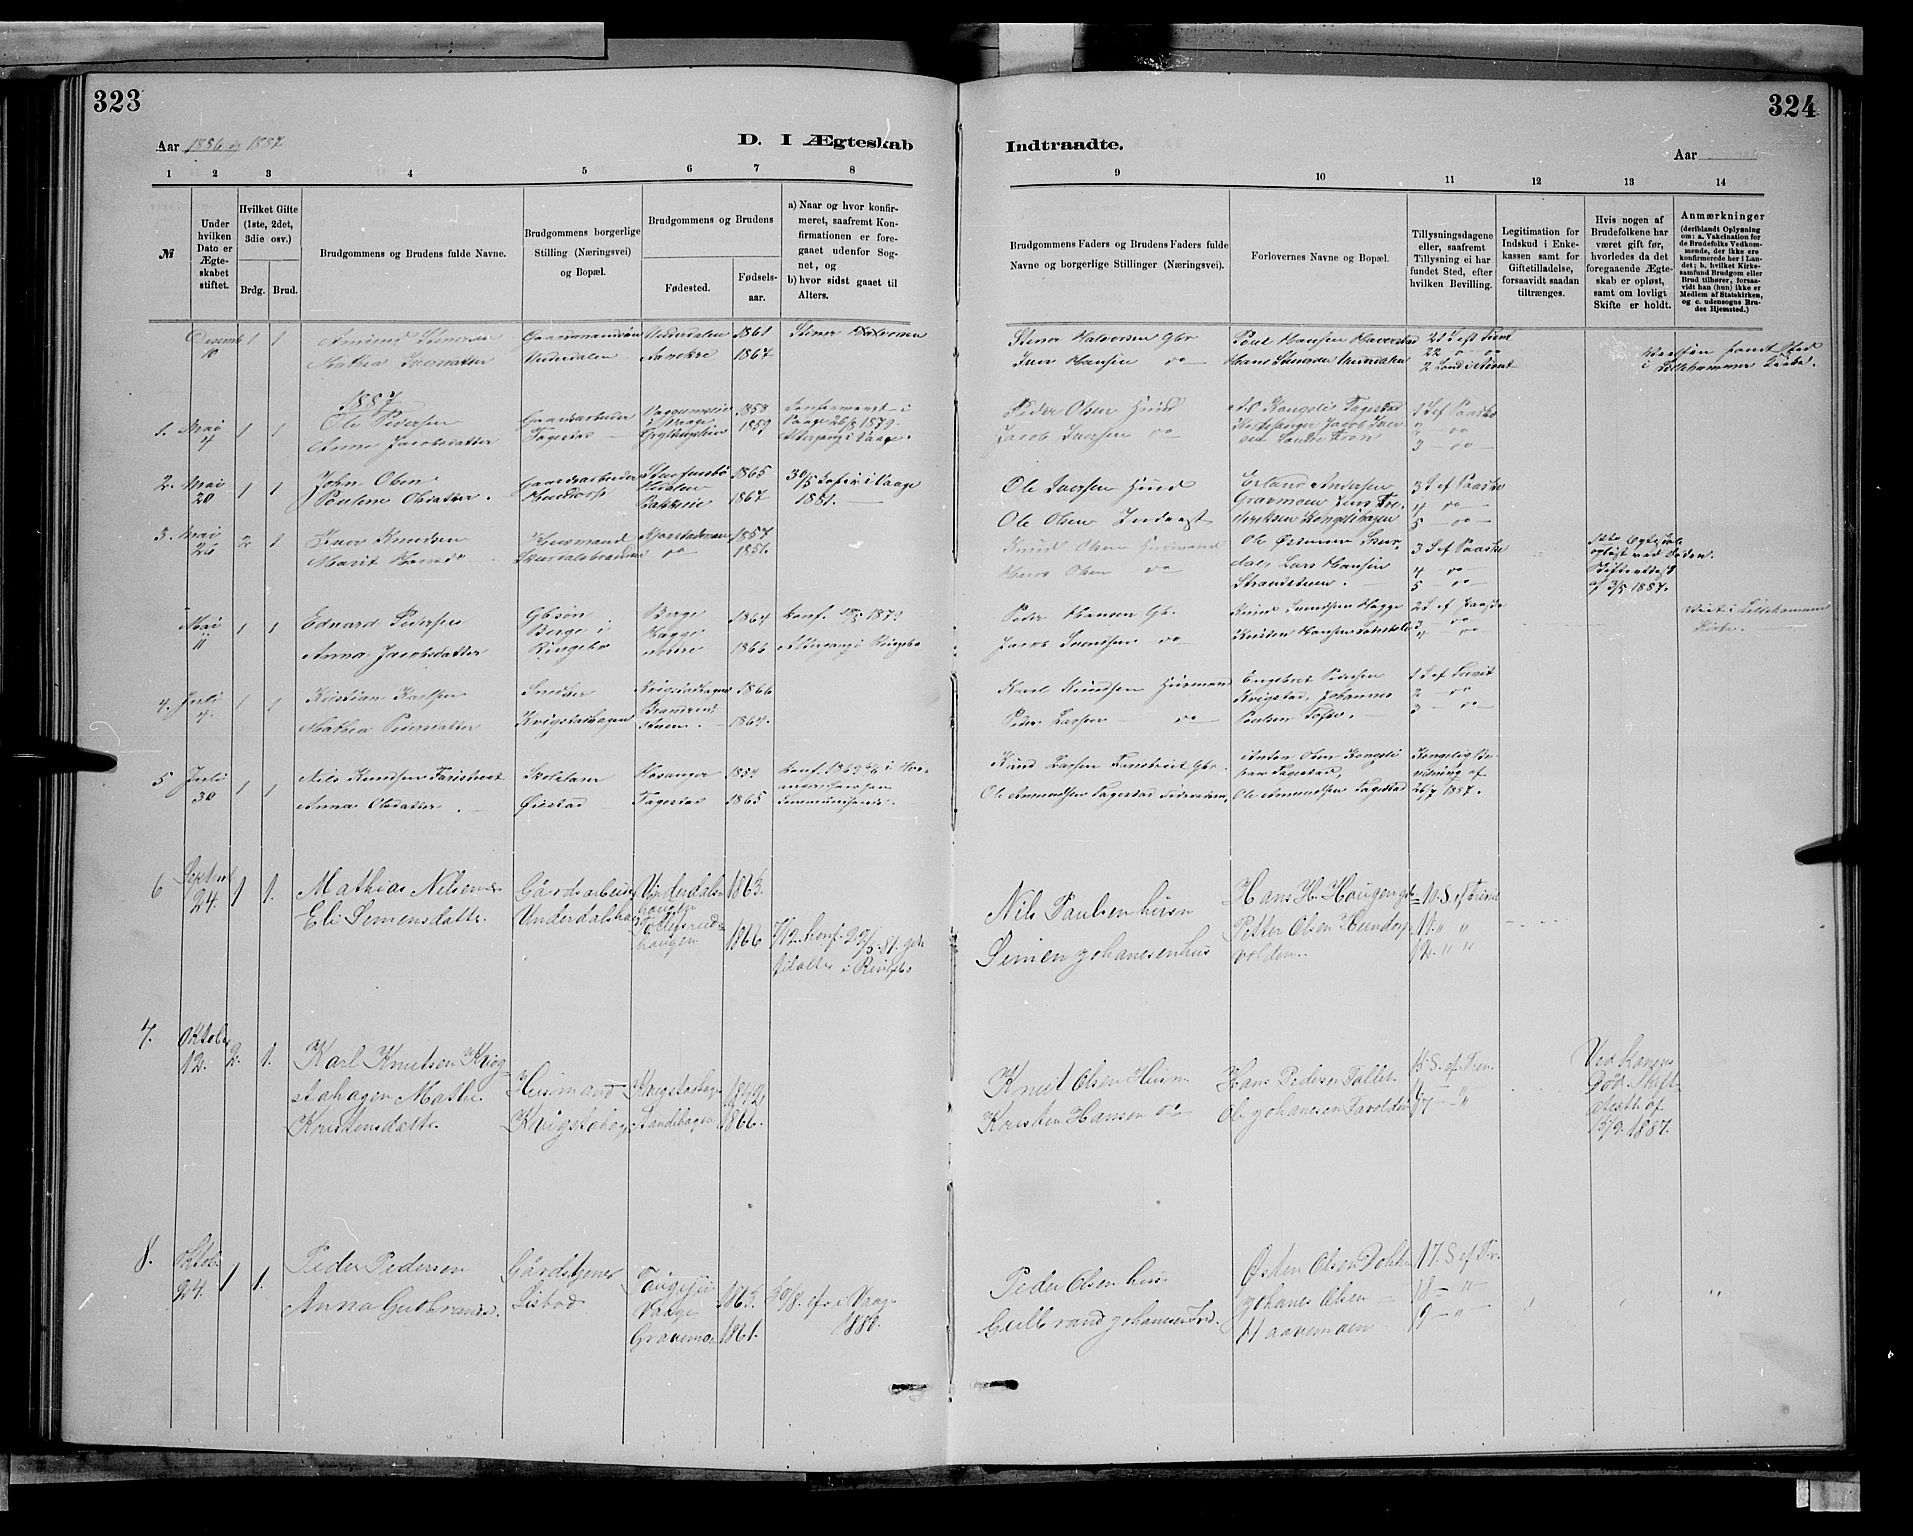 SAH, Sør-Fron prestekontor, H/Ha/Hab/L0003: Klokkerbok nr. 3, 1884-1896, s. 323-324